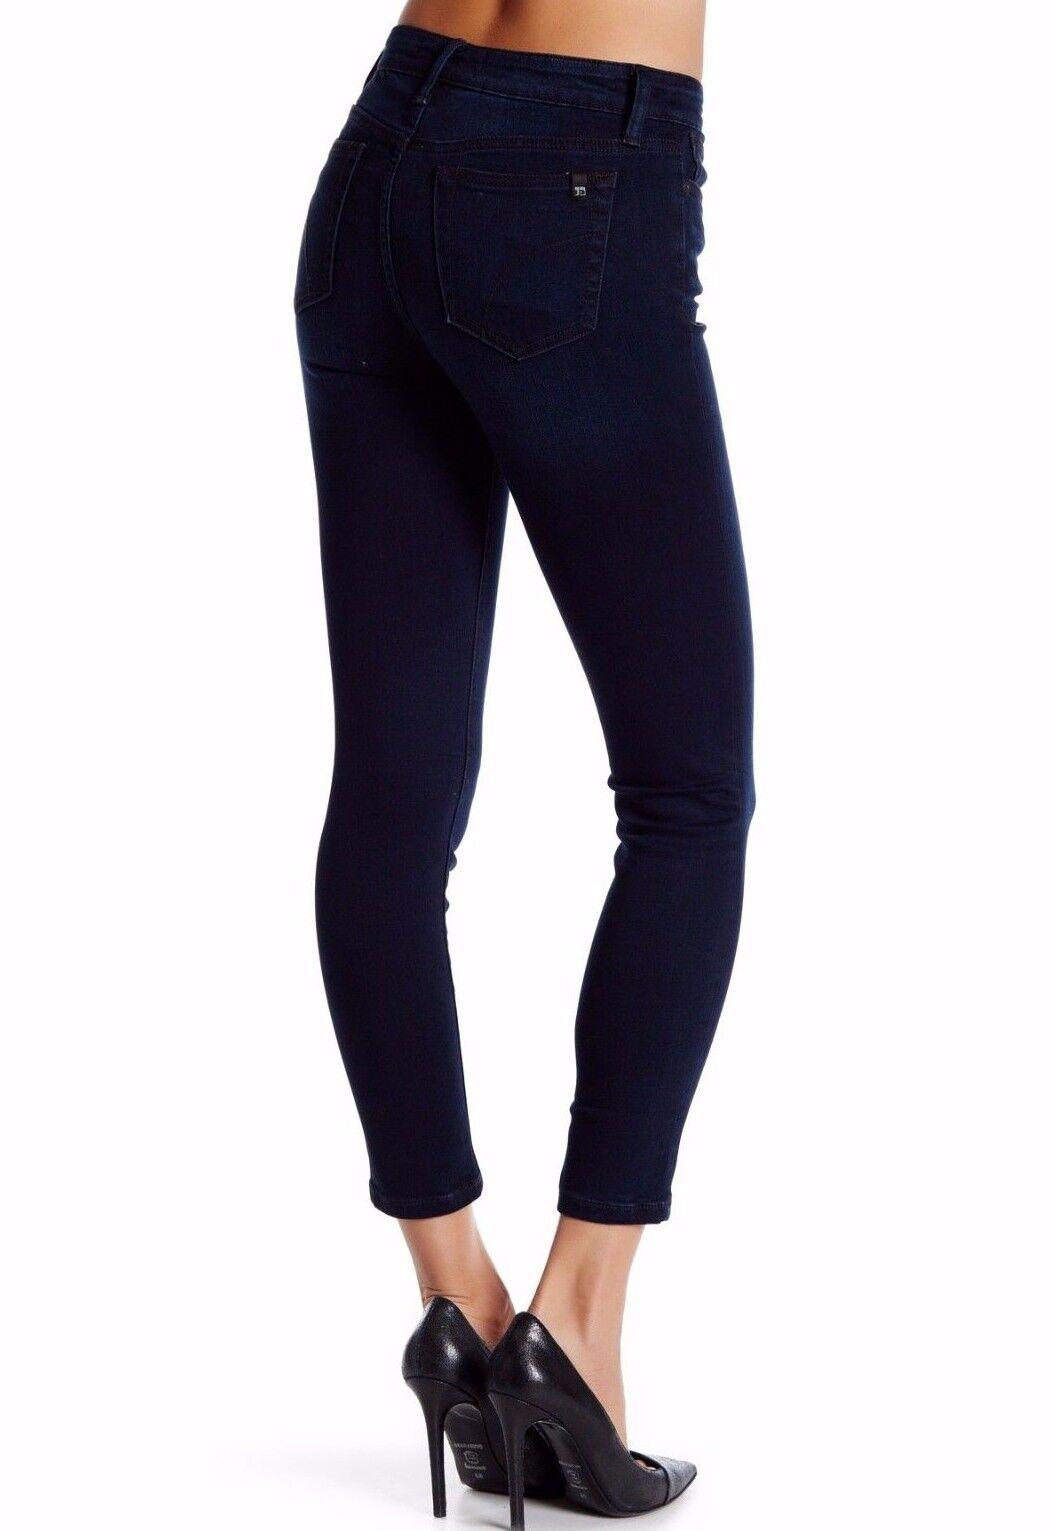 Nwt JOE´S Damen Sz26 Symbol Skinny Knöchel Midrise Jeans Stretch Rhys